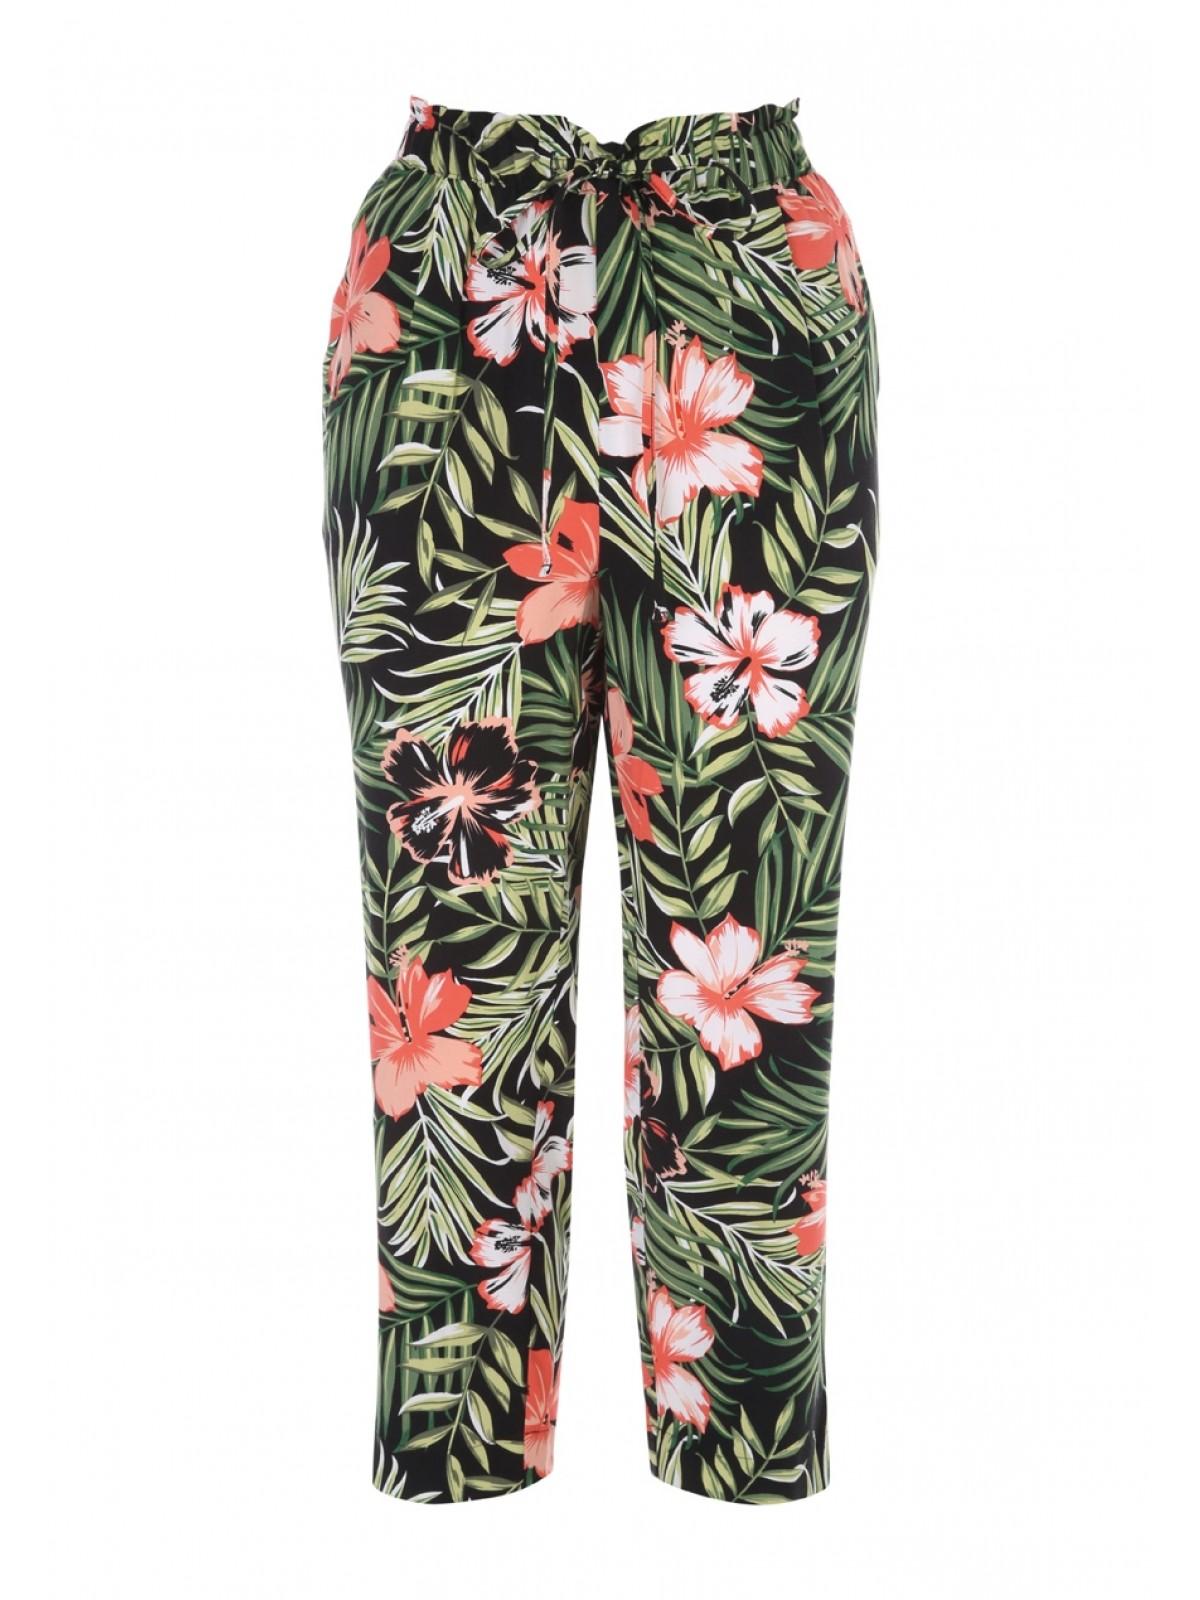 Peacocks tropical trousers.jpg